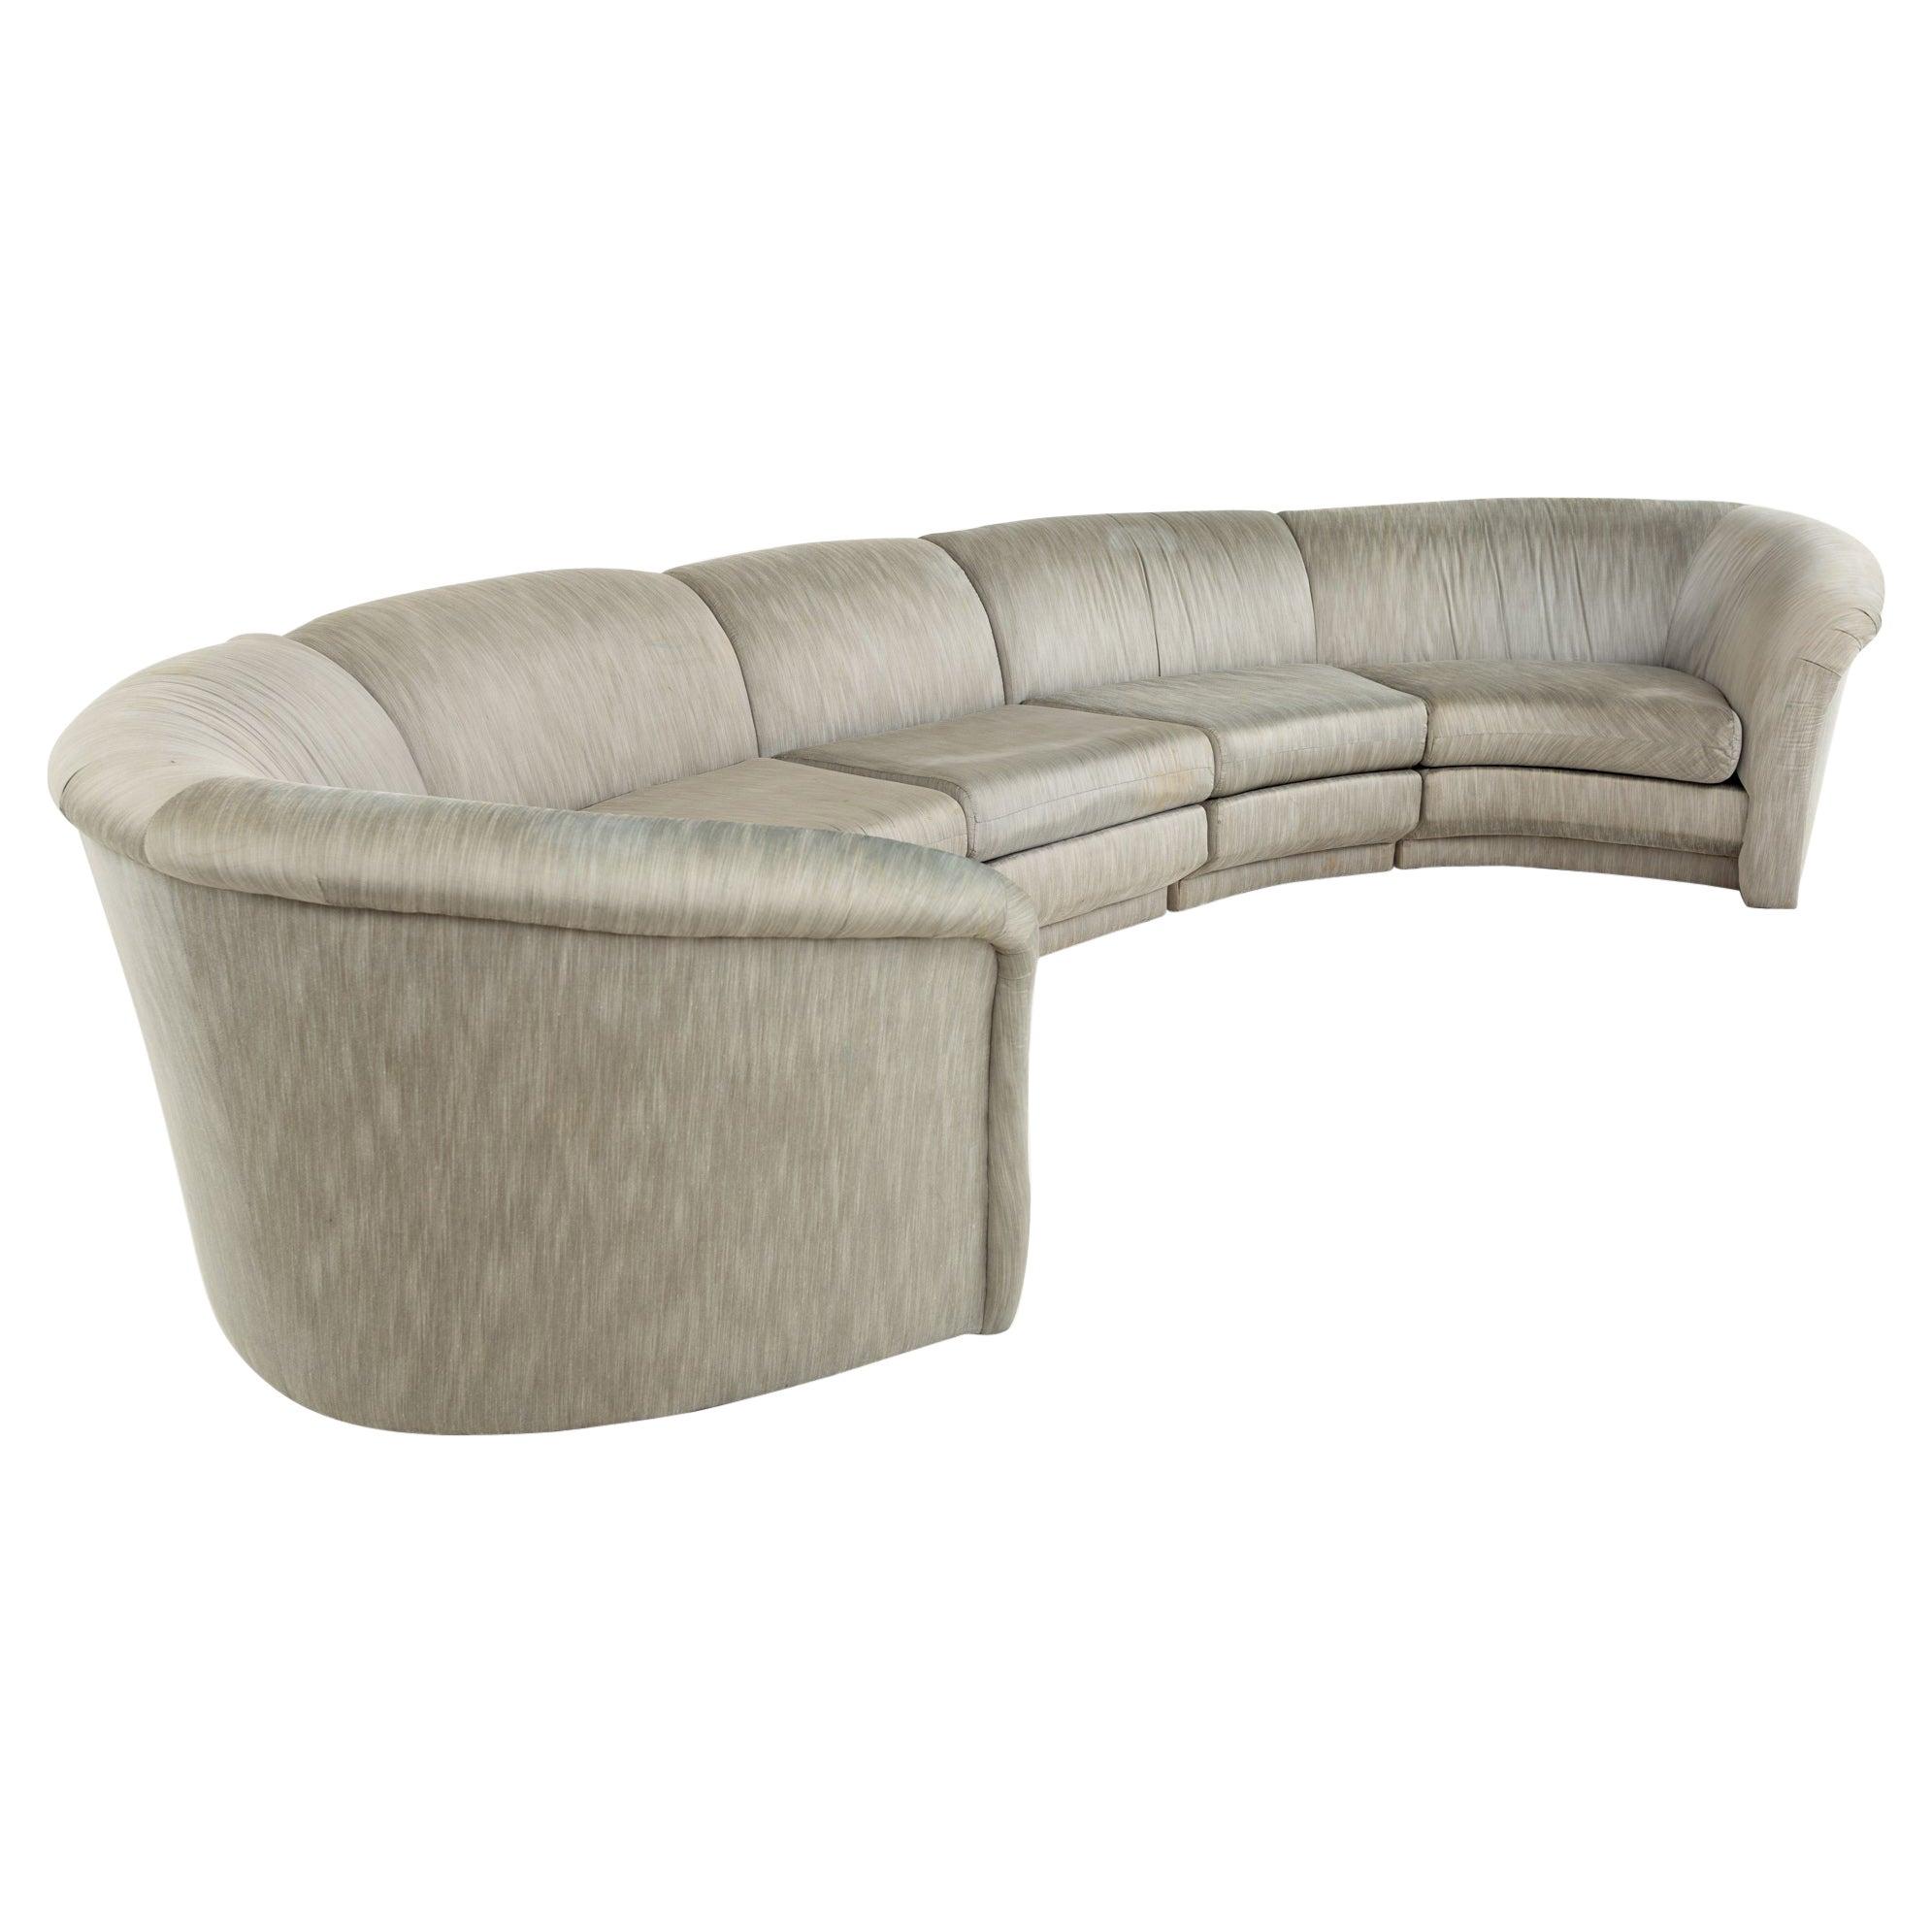 Thayer Coggin Mid Century Circular Sectional Sofa